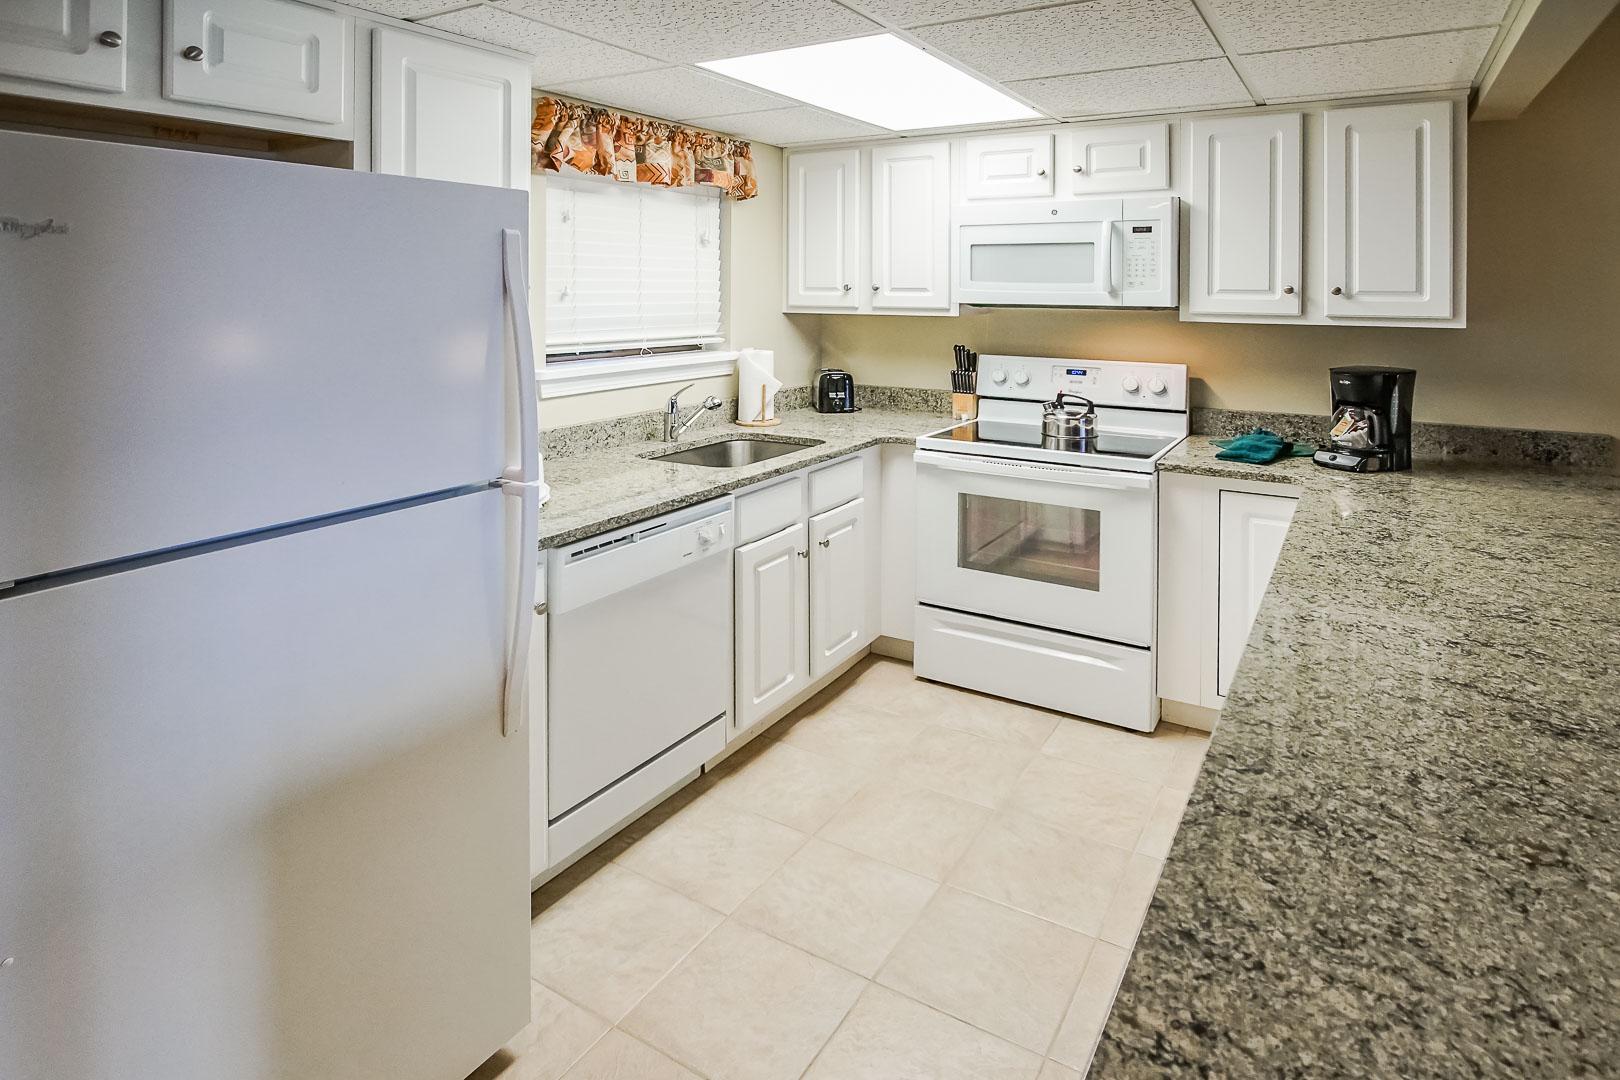 A spacious kitchen at VRI's Tanglwood Resort in Pennsylvania.